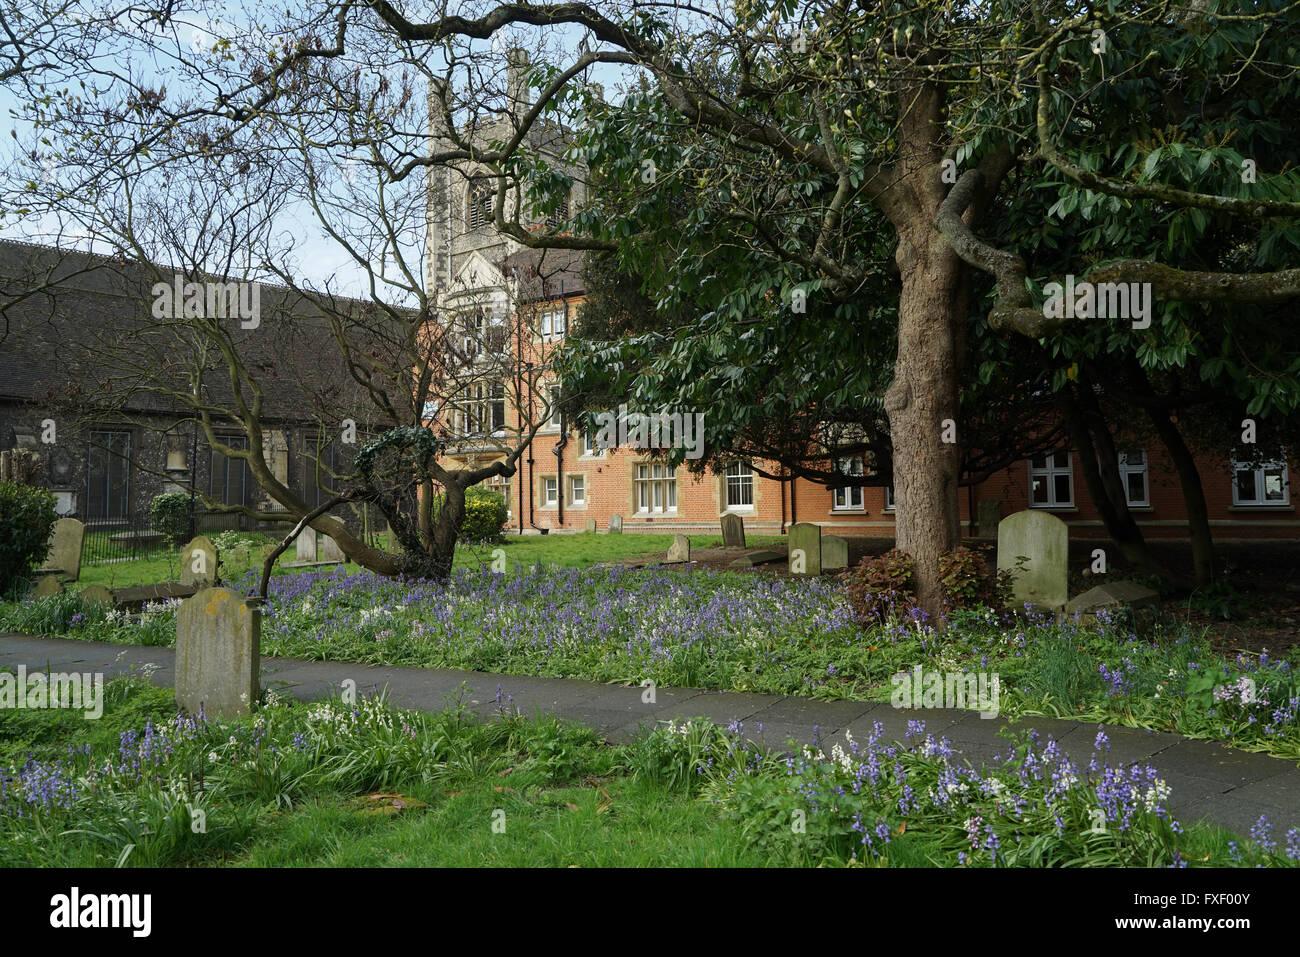 Saint Laurence Churchyard, Reading, Berkshire -1 - Stock Image